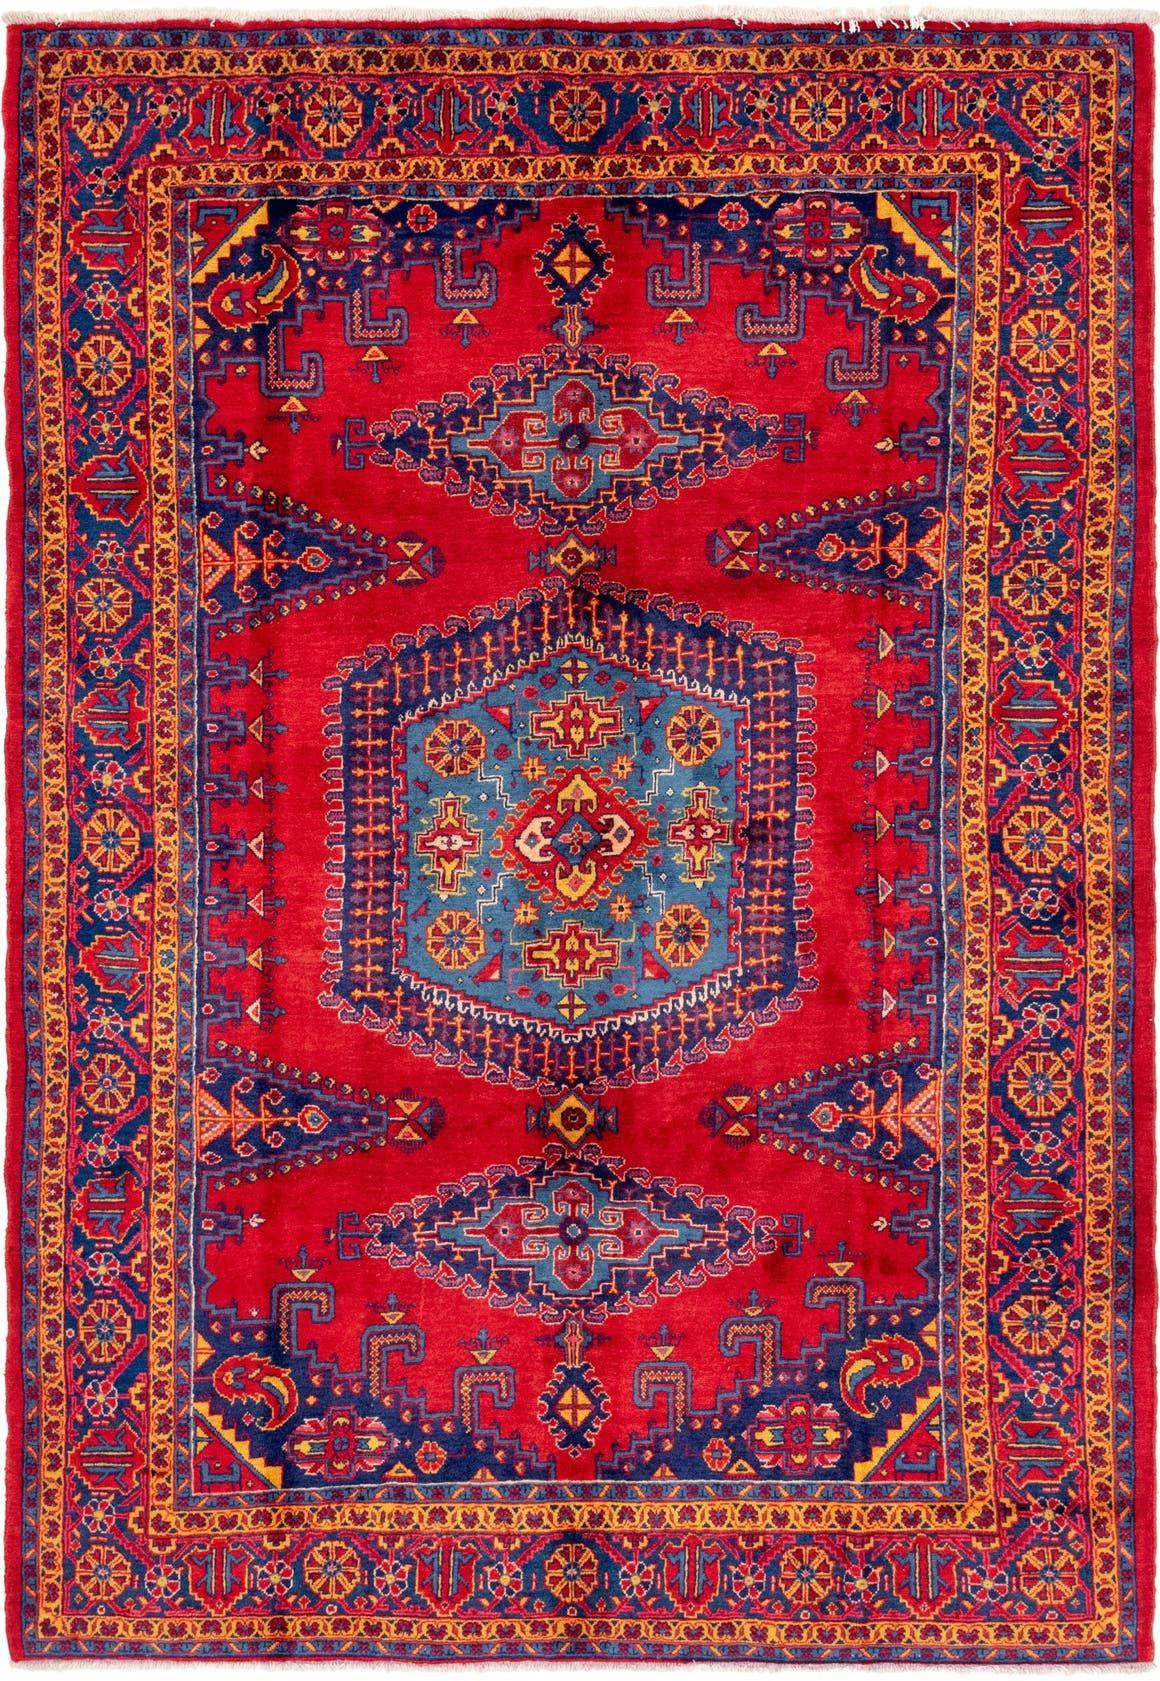 Viss Red Antique 8x11 Area Rug In 2020 Antique Rugs Persian Carpet Rugs Antique Rugs